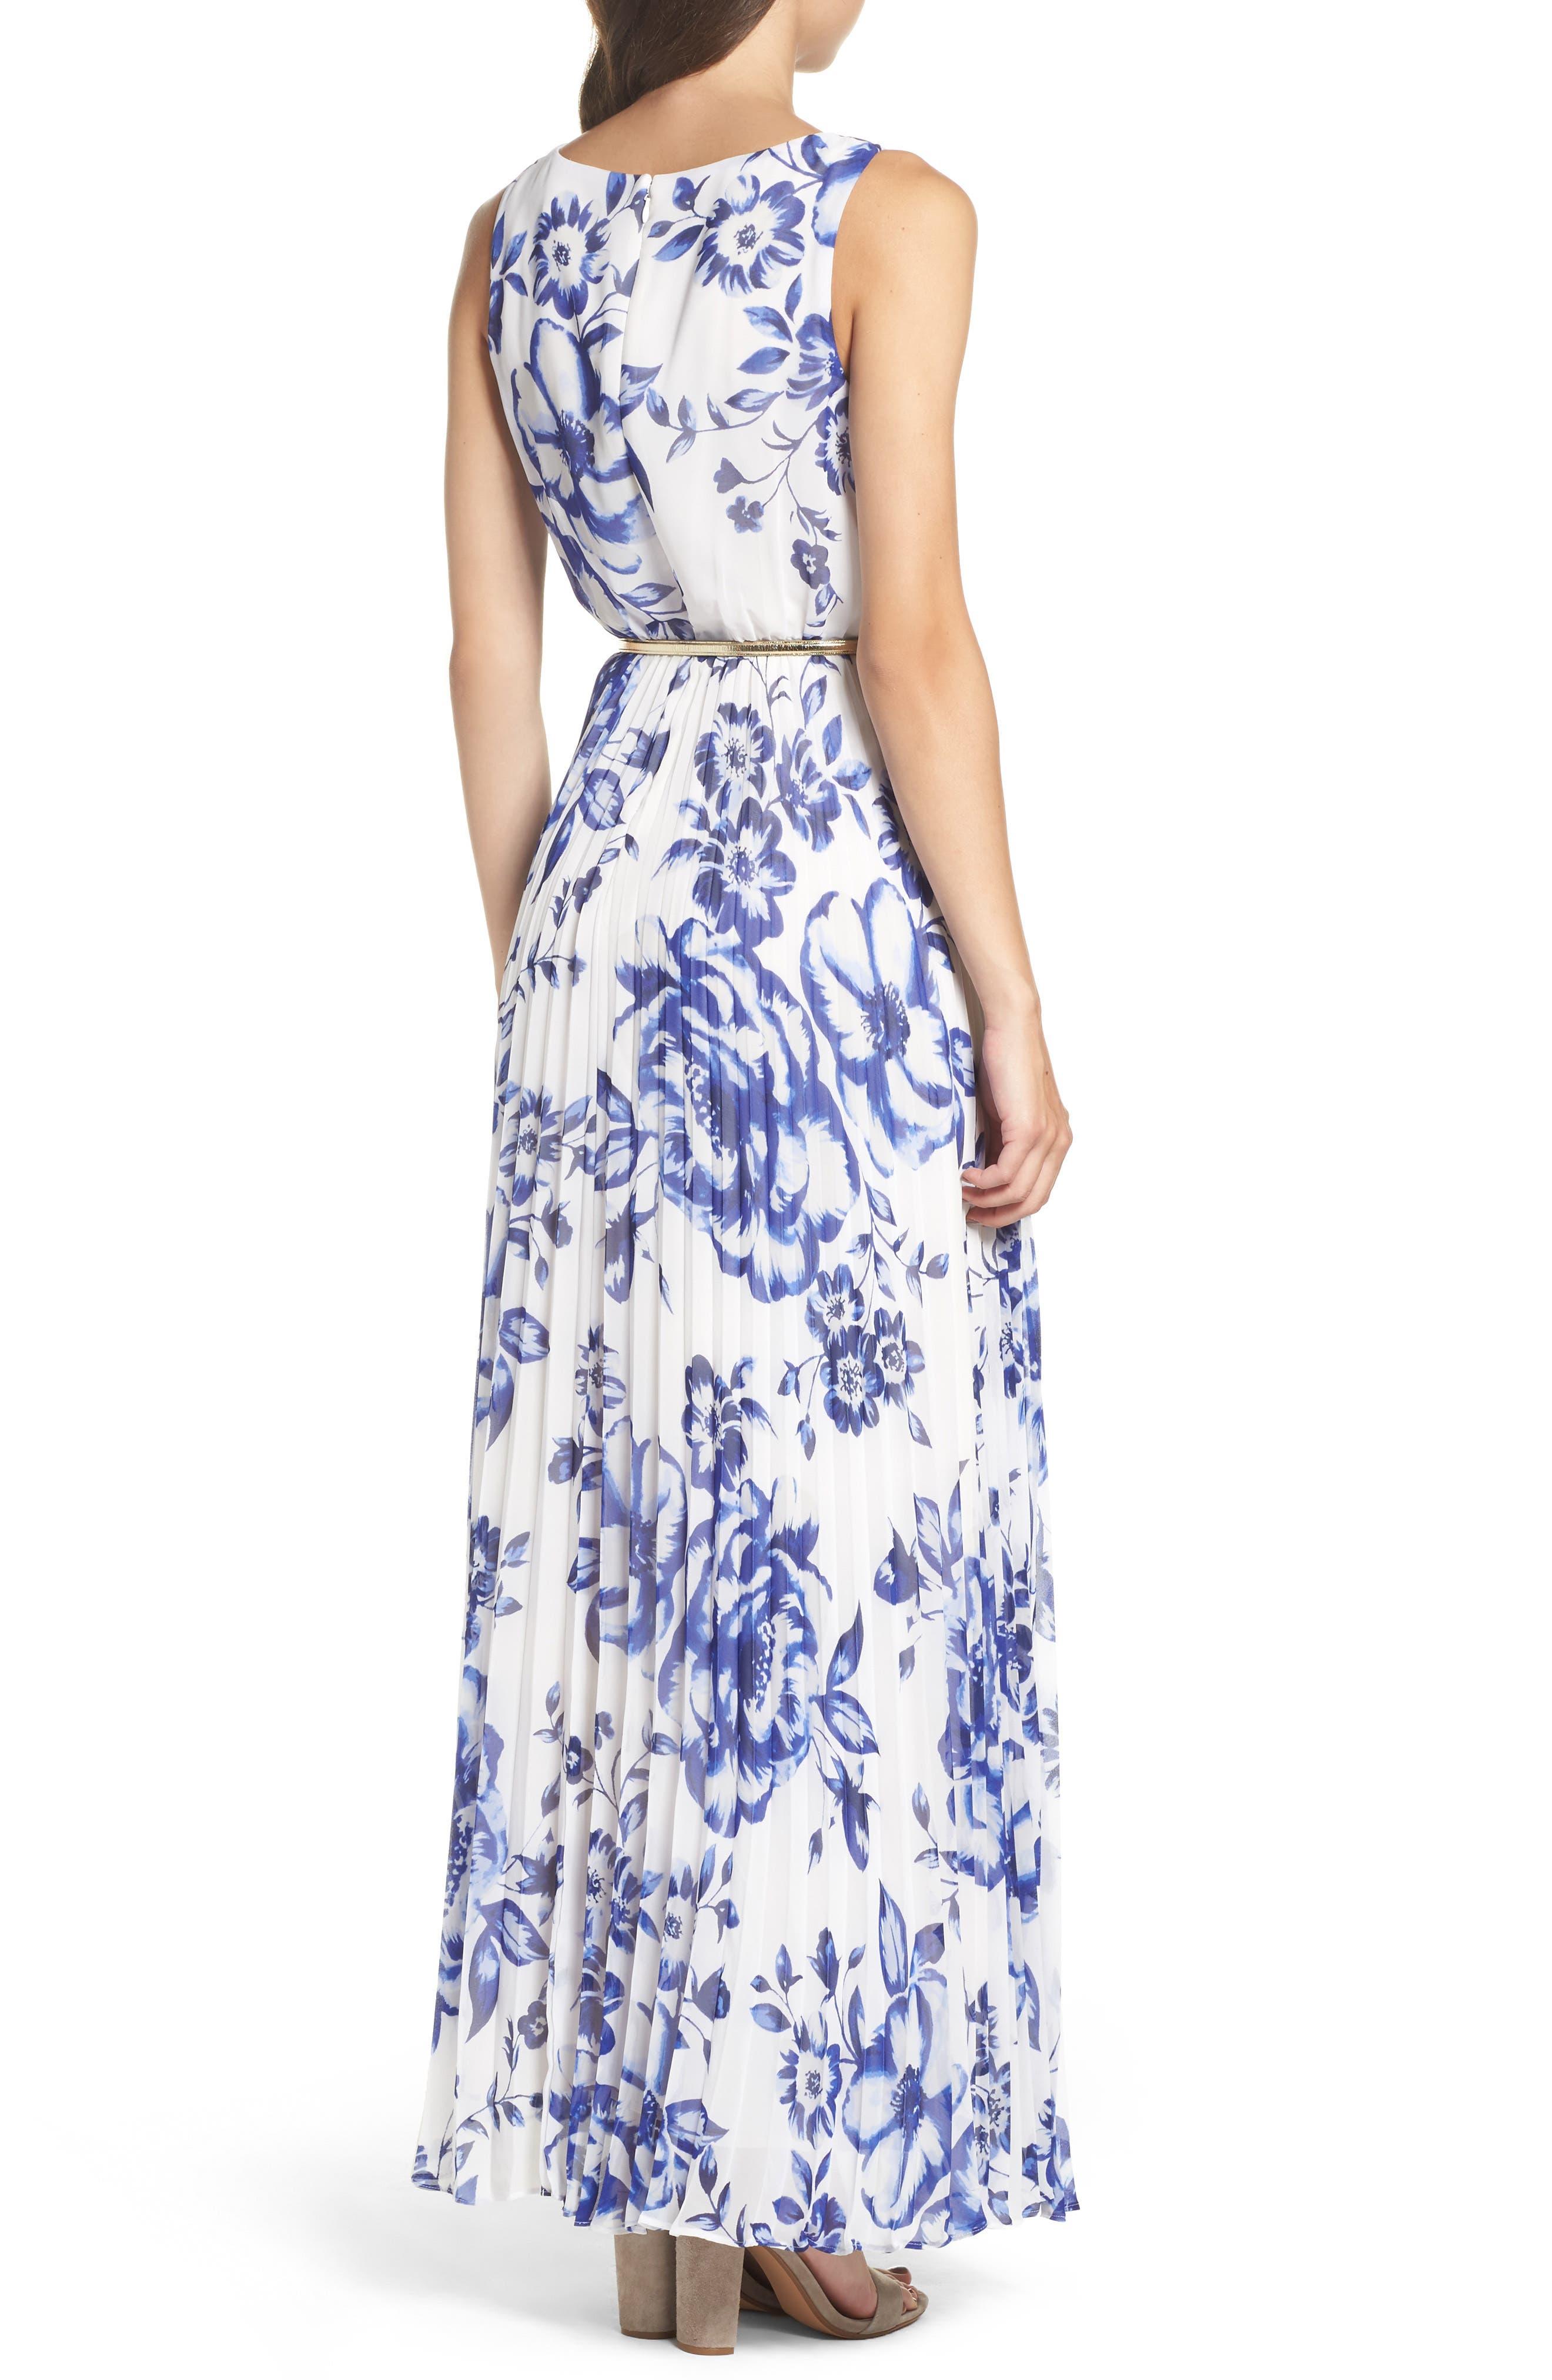 ELIZA J, Pleated Floral Chiffon Maxi Dress, Alternate thumbnail 2, color, COBALT